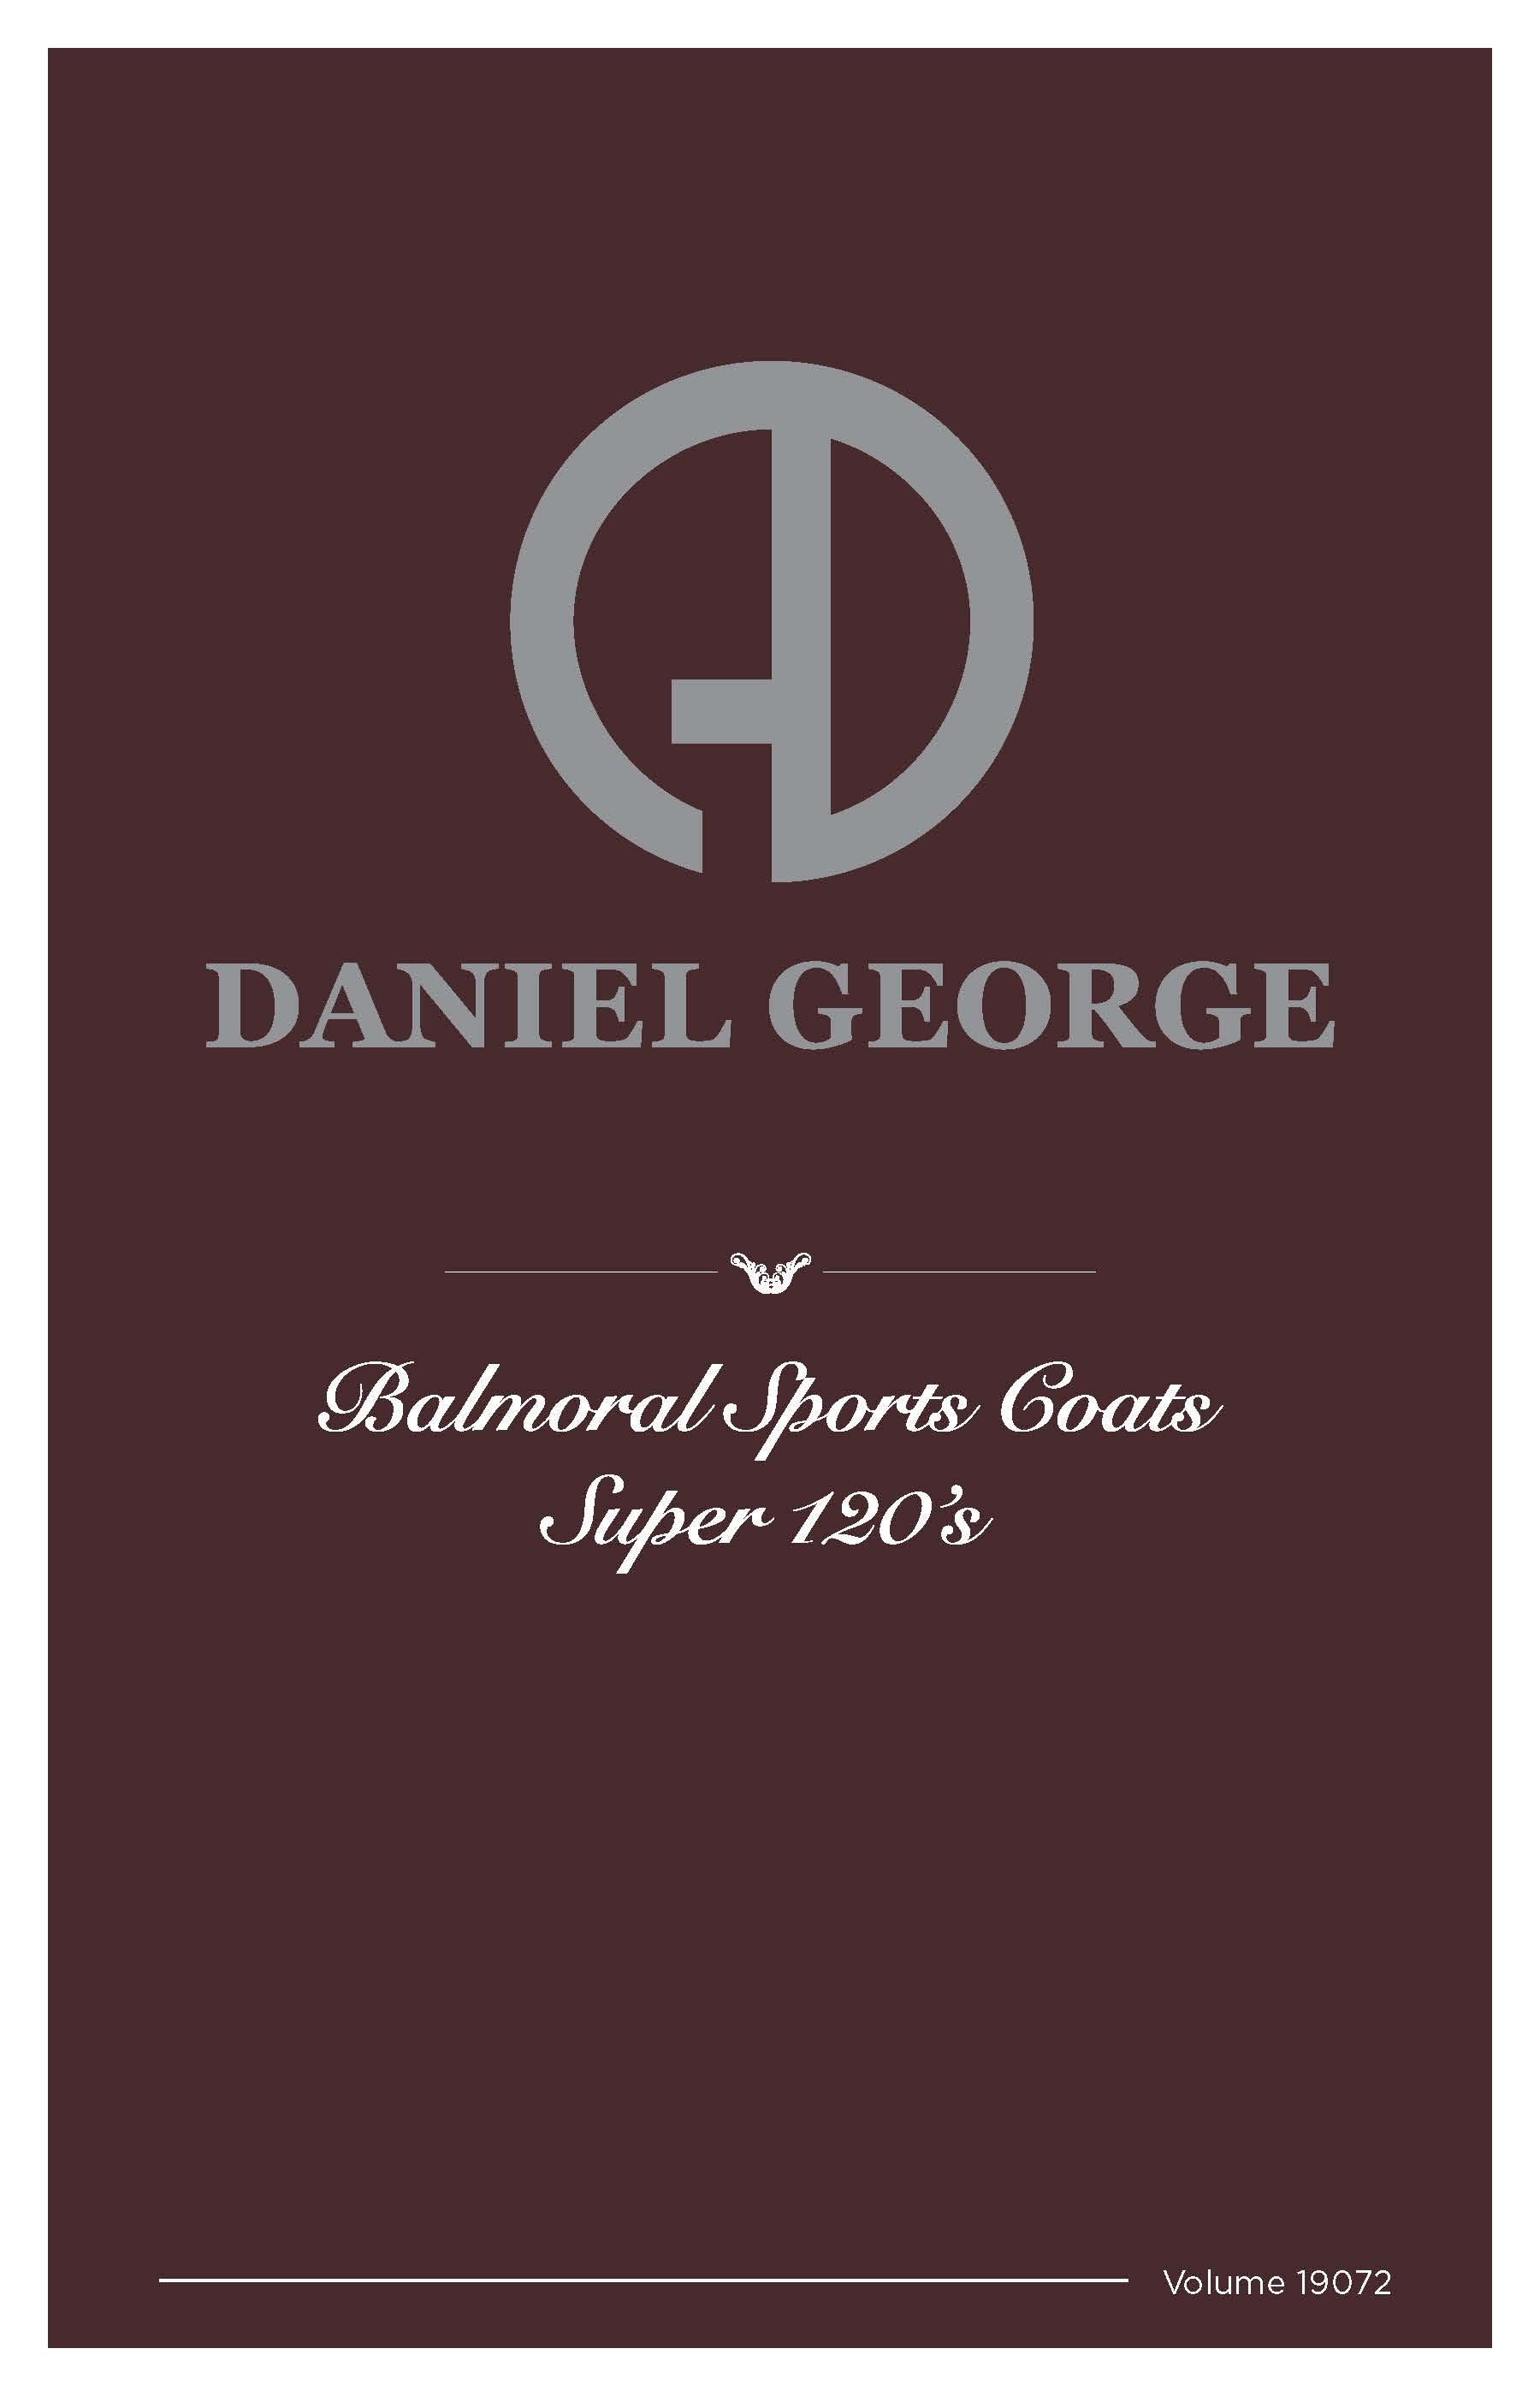 digital_collection_DG_kensington_balmoral_sport_coats_19072_Page_1.jpg